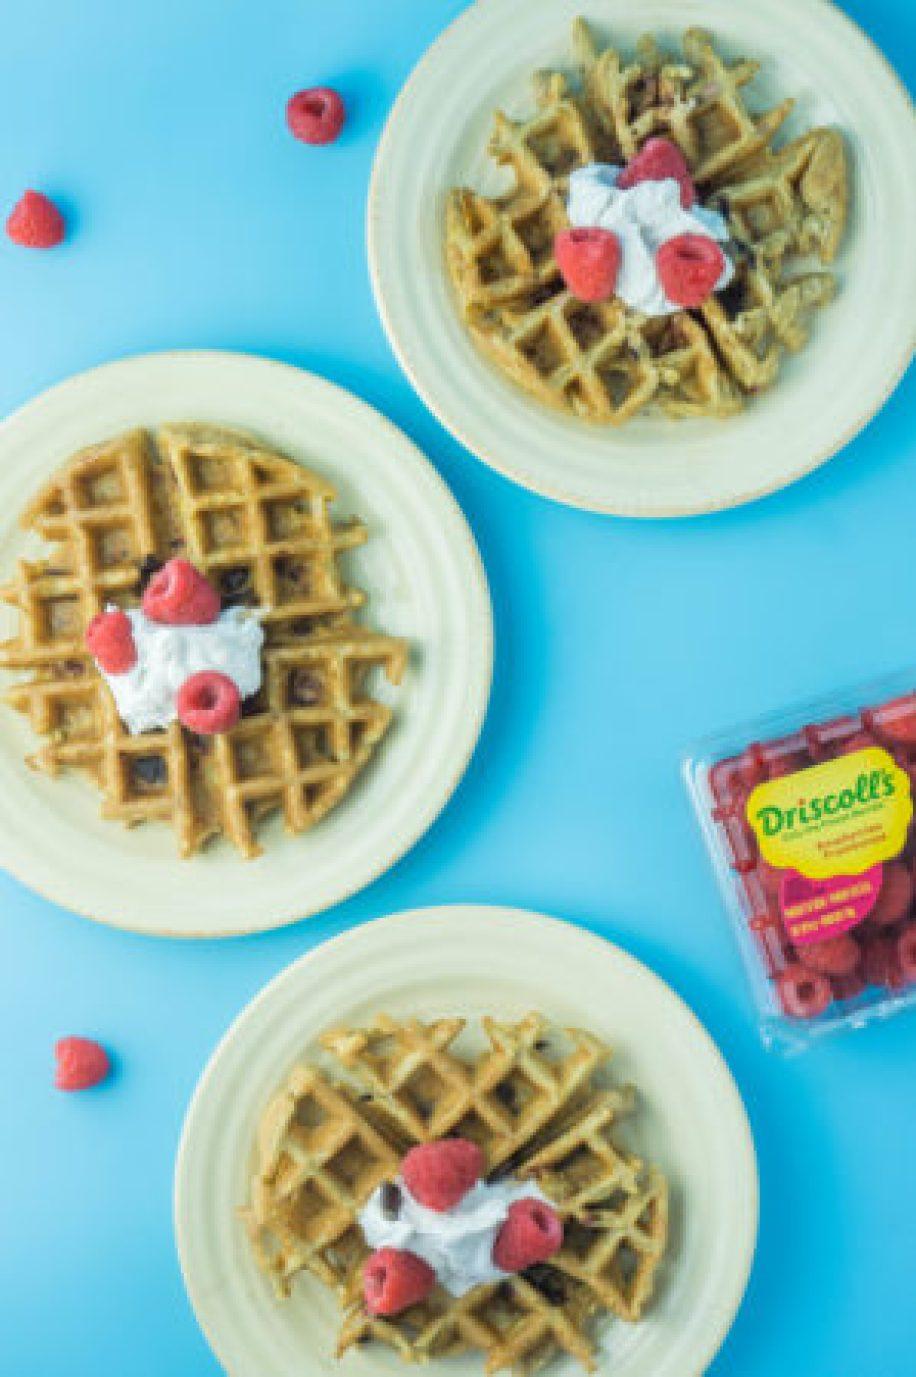 Healthy Raspberry Chocolate Chunk Waffles! #Driscolls #sponsored #healthyrecipe   www.wakeuptowaffles.com